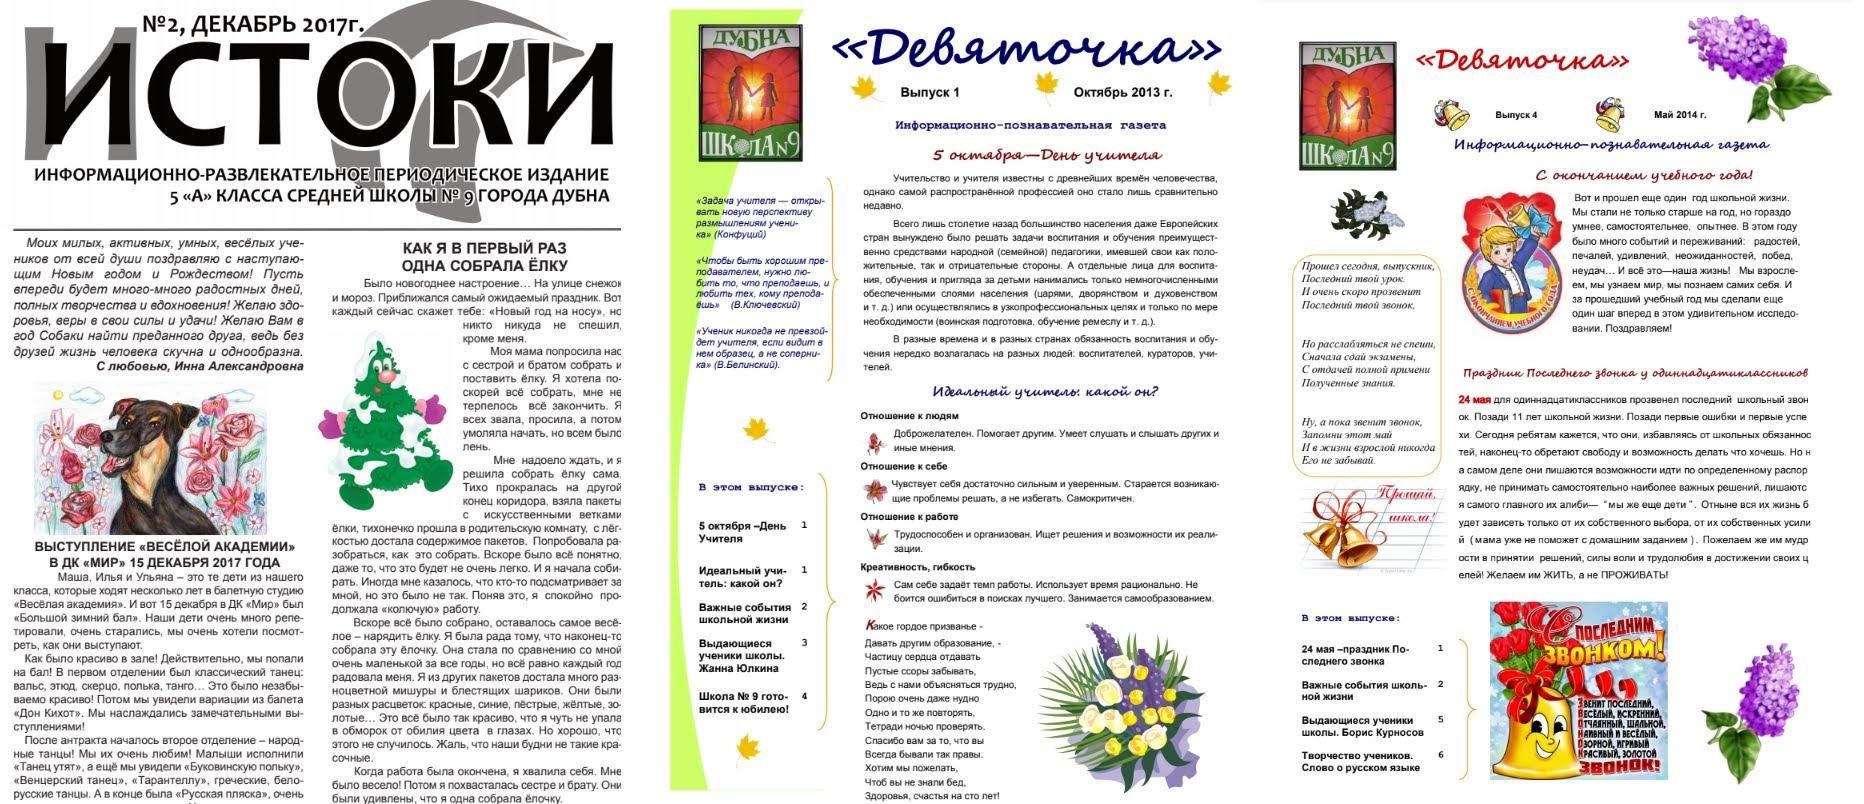 https://sites.google.com/a/9sch.ru/home/deatelnost/innovacionnaa-obrazovatelnaa-deatelnost/programmy-i-proekty/proekty-realizuemye-v-skole/skolnaa-gazeta-devatocka